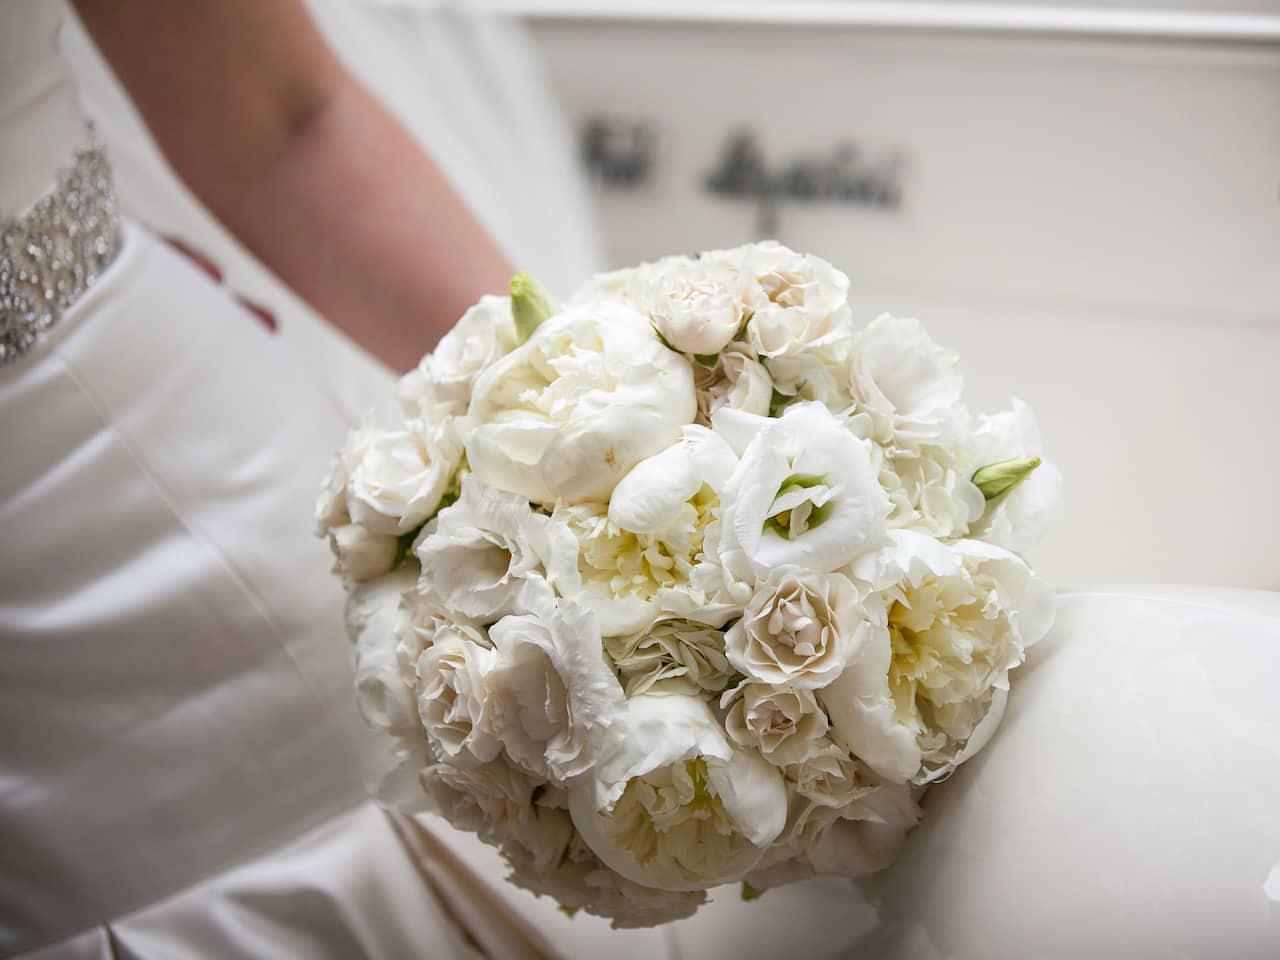 Wedding Bouquet at Hôtel du Louvre by Hyatt in Central Paris